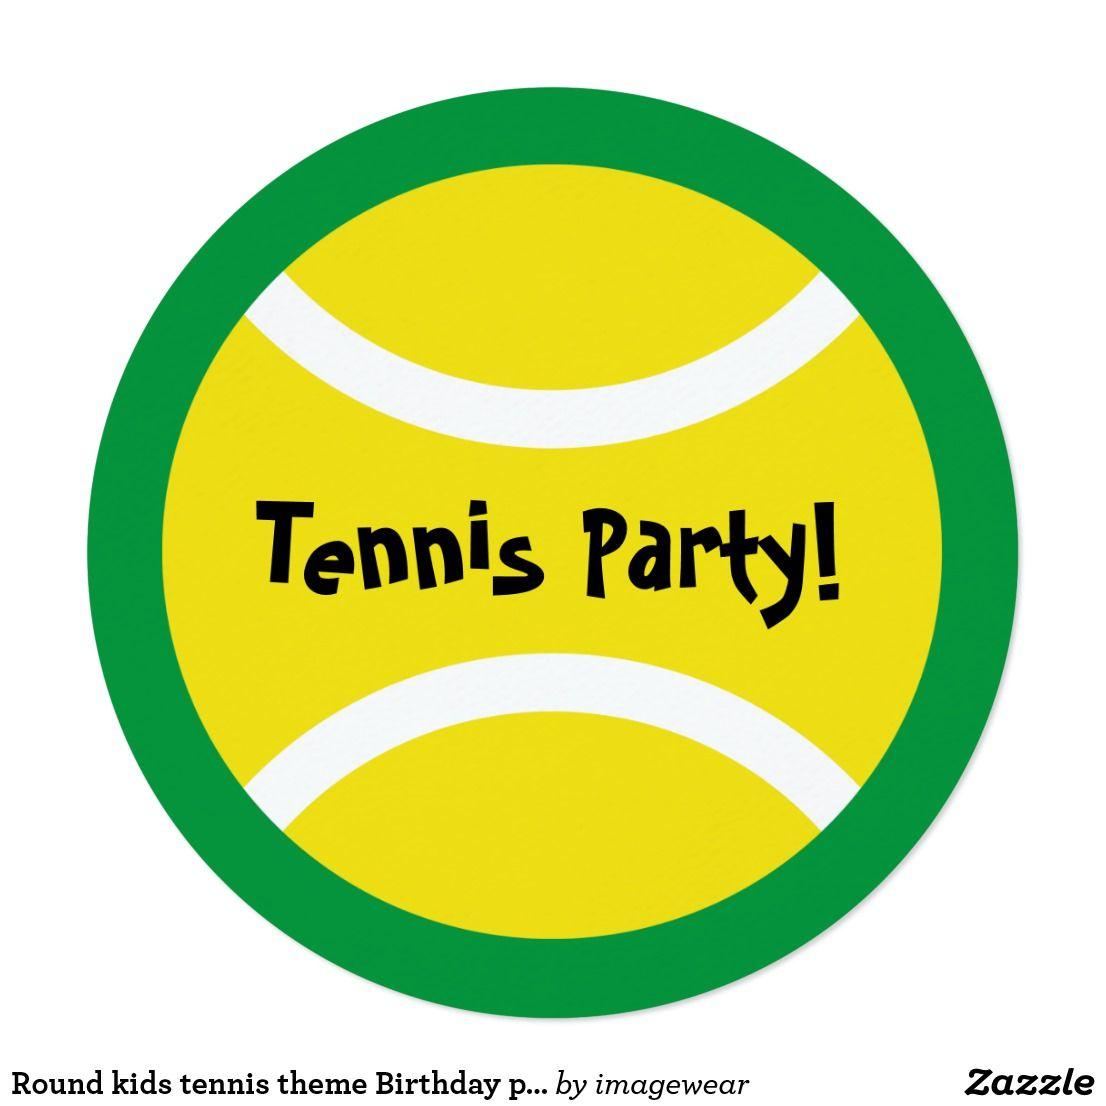 Round kids tennis theme Birthday party invitations | Party ...